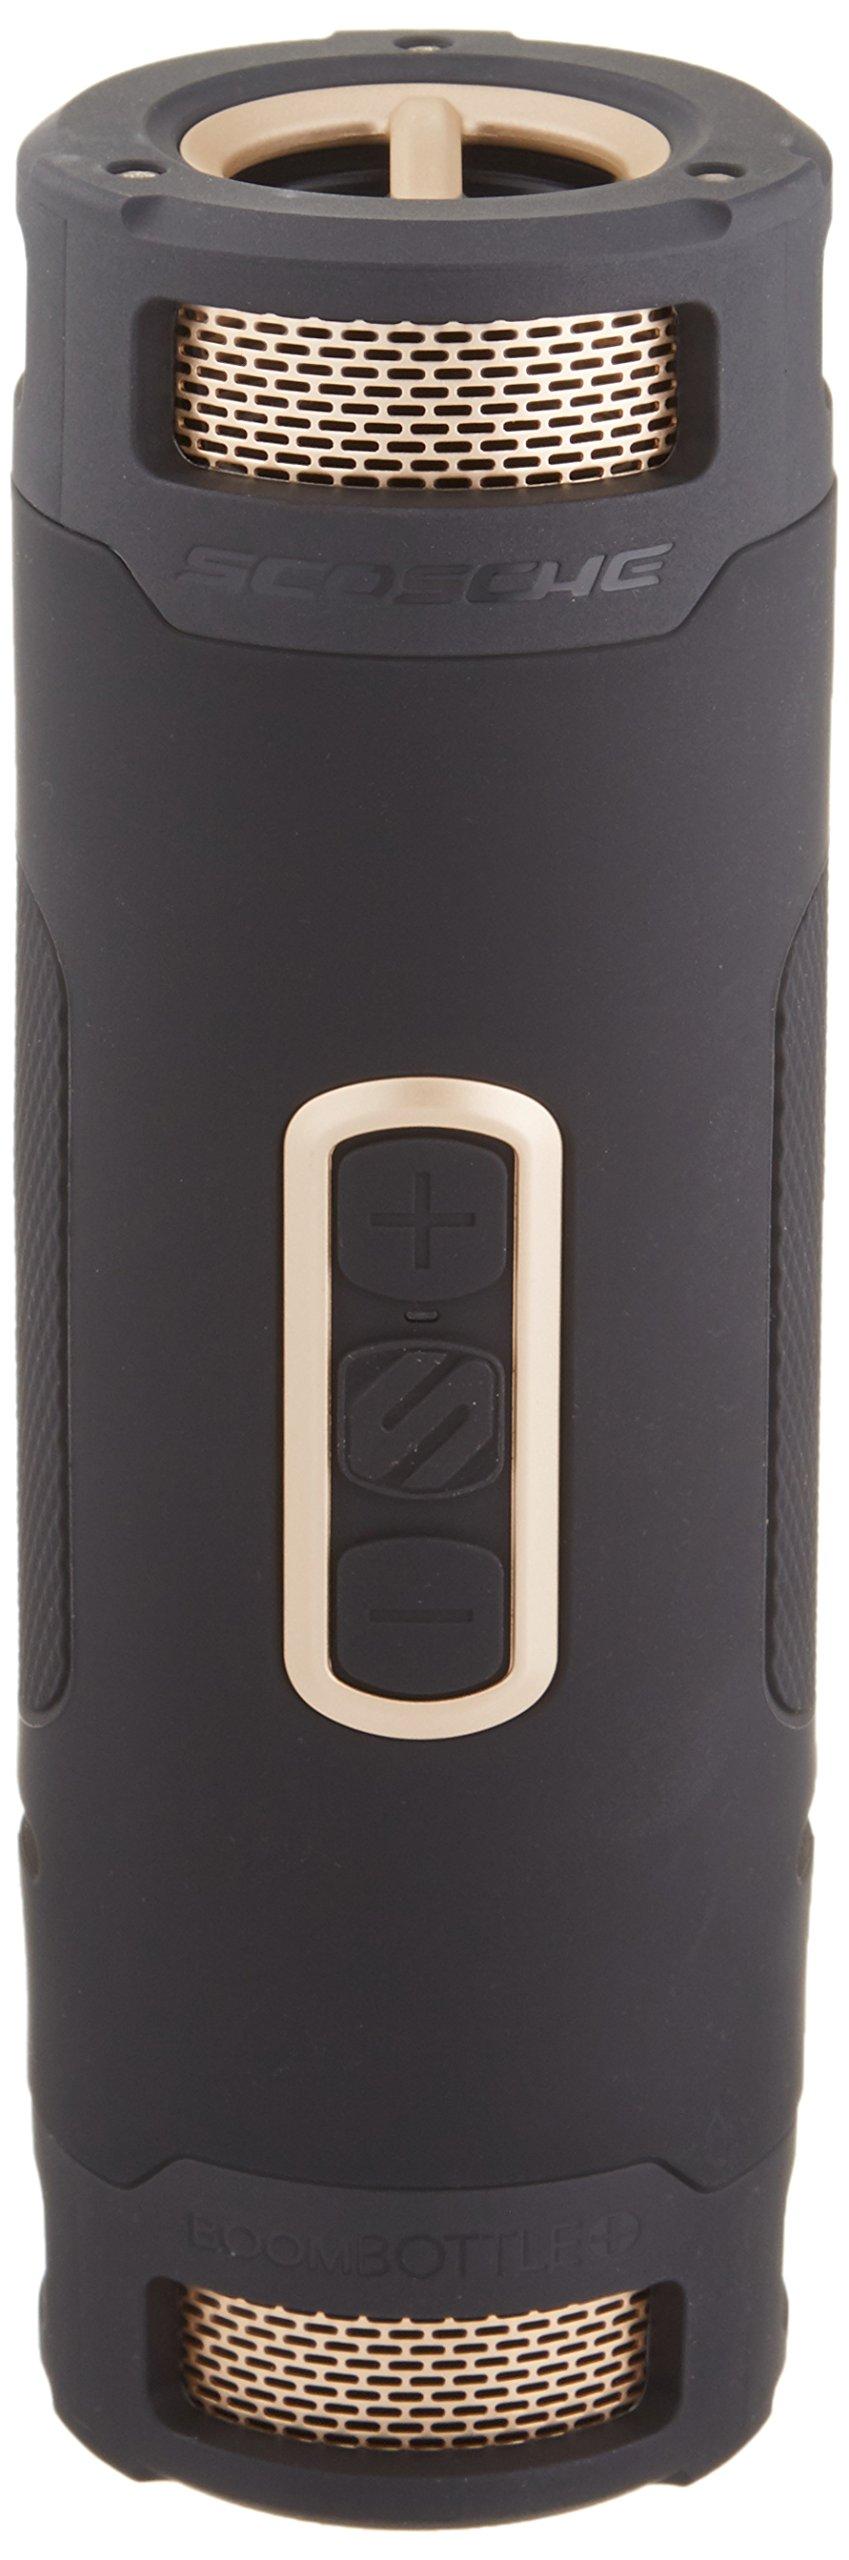 SCOSCHE BoomBottle+ Rugged Waterproof Portable Wireless Bluetooth 4.0 Speaker - Dual 360-Degree 12 Watt 50mm Speakers with Subwoofer and Indoor/Outdoor EQ Functions - Black/Gold (BTBPBKGD)